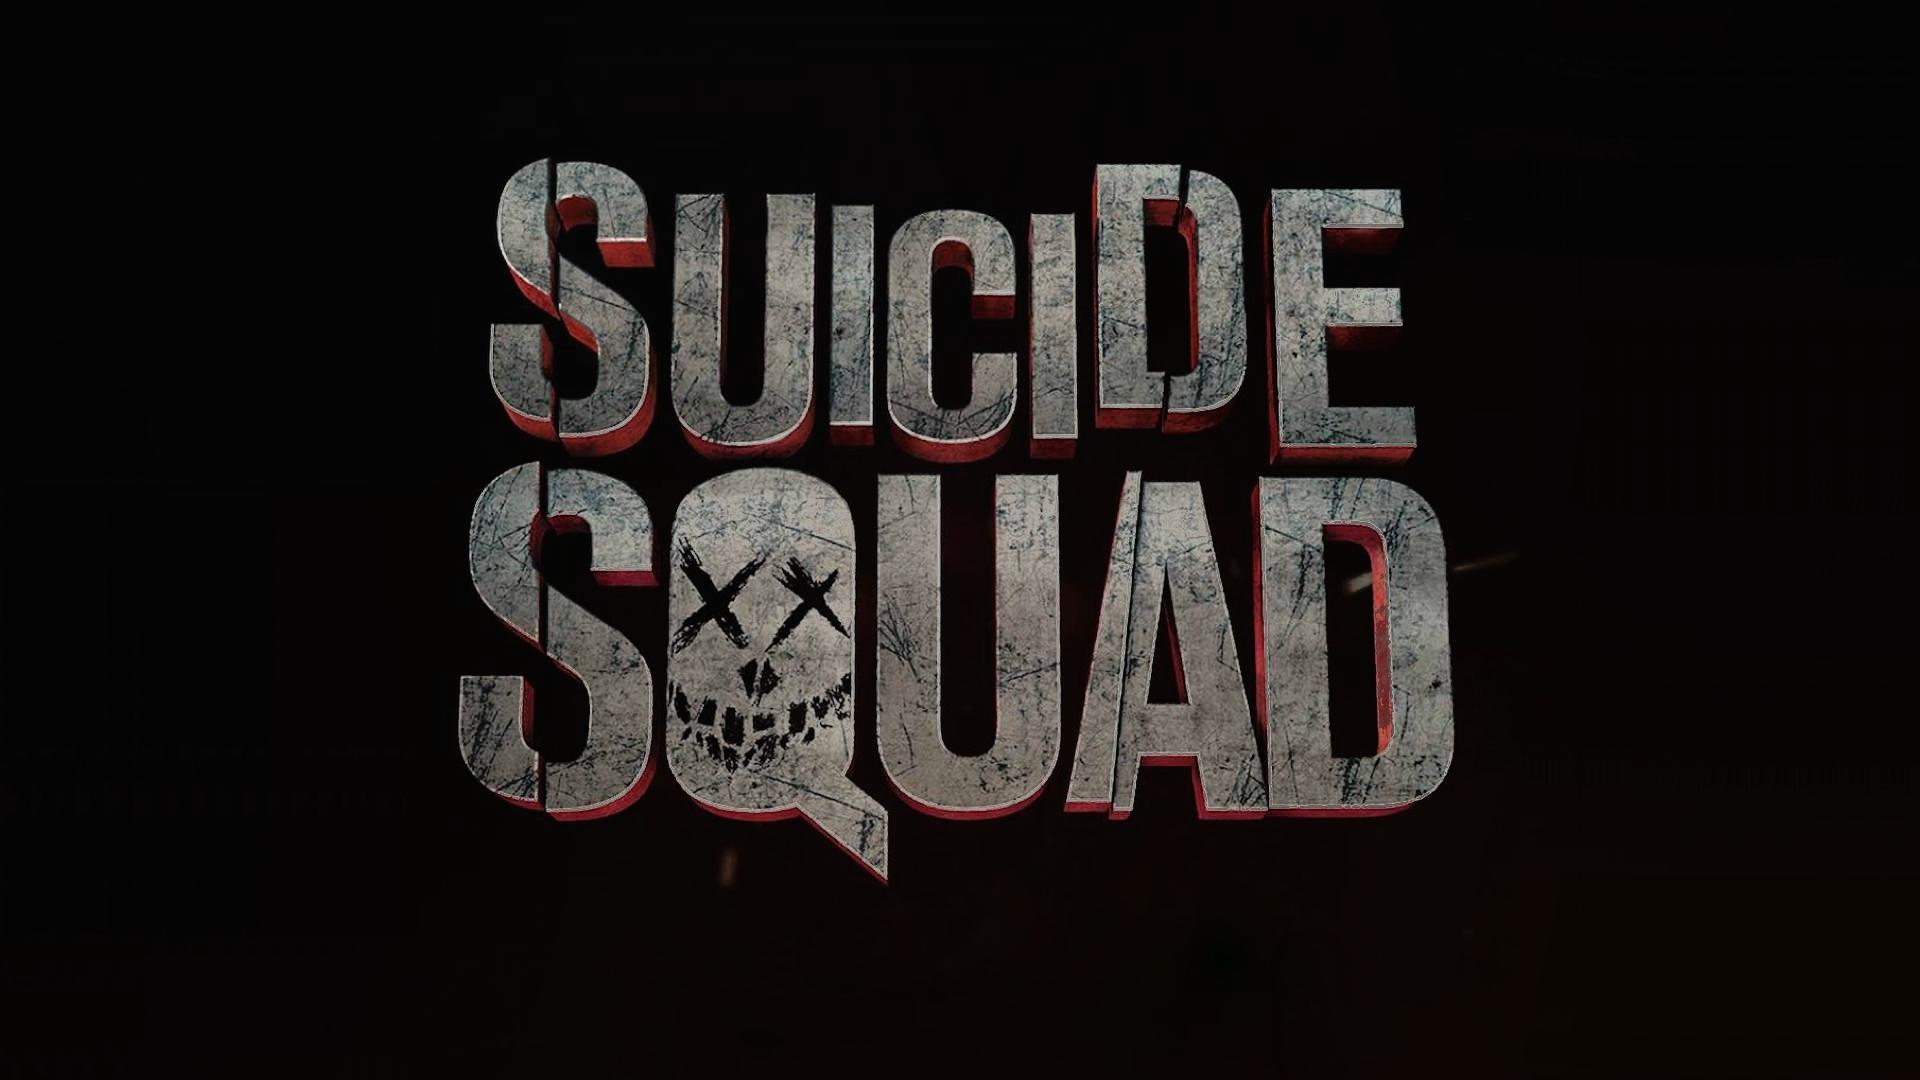 suicide squad logo wallpaper 61372 1920x1080 px ~ hdwallsource